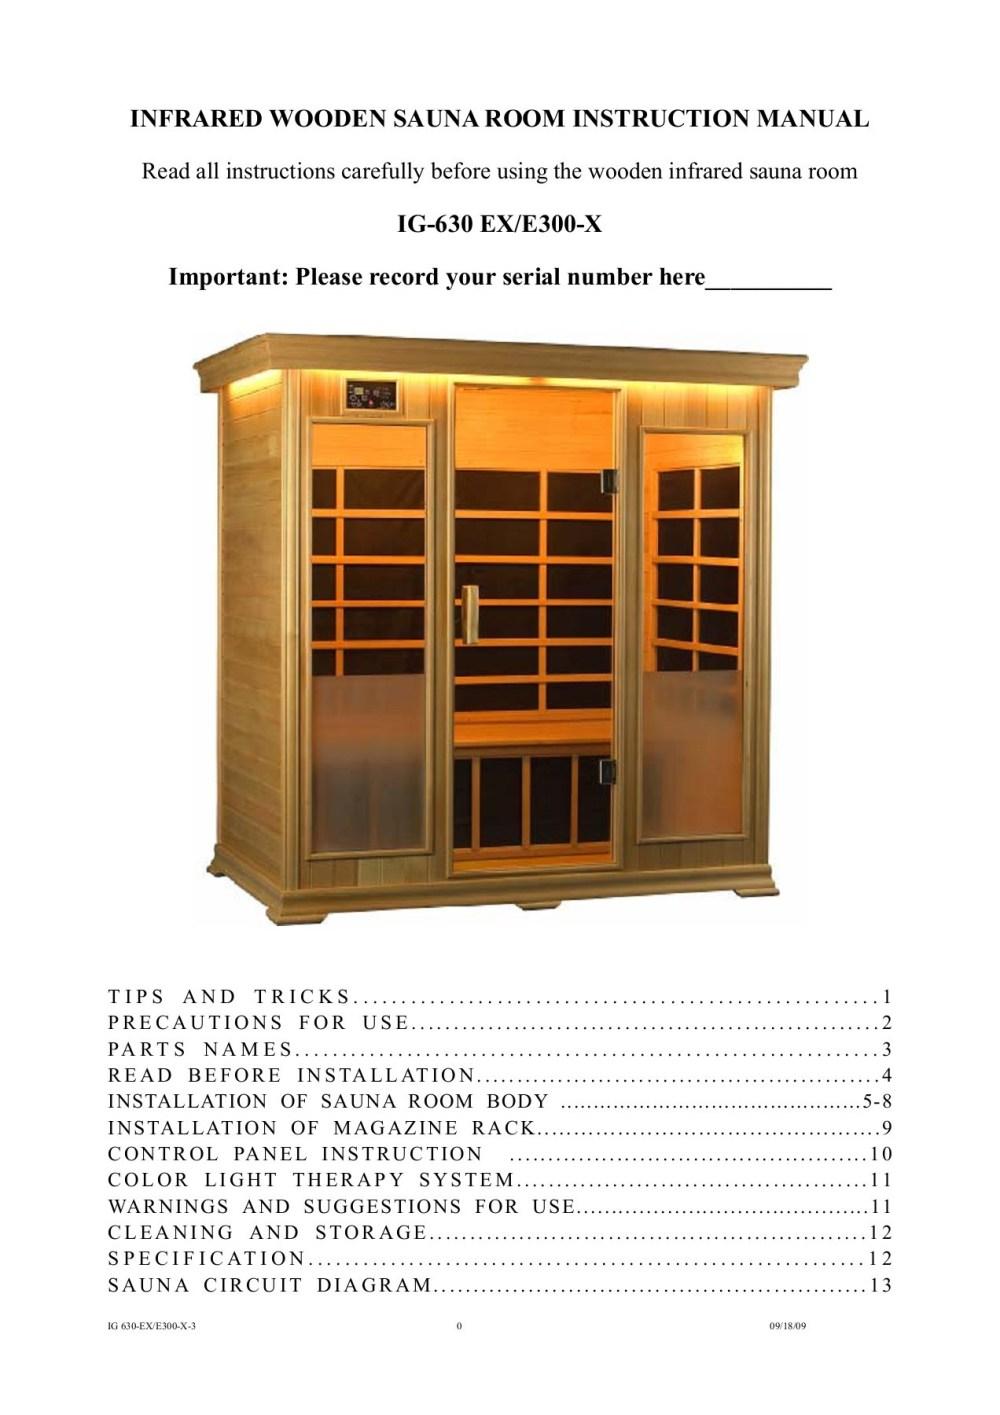 medium resolution of infrared wooden sauna room instruction finnleo pages 1 15 text version fliphtml5